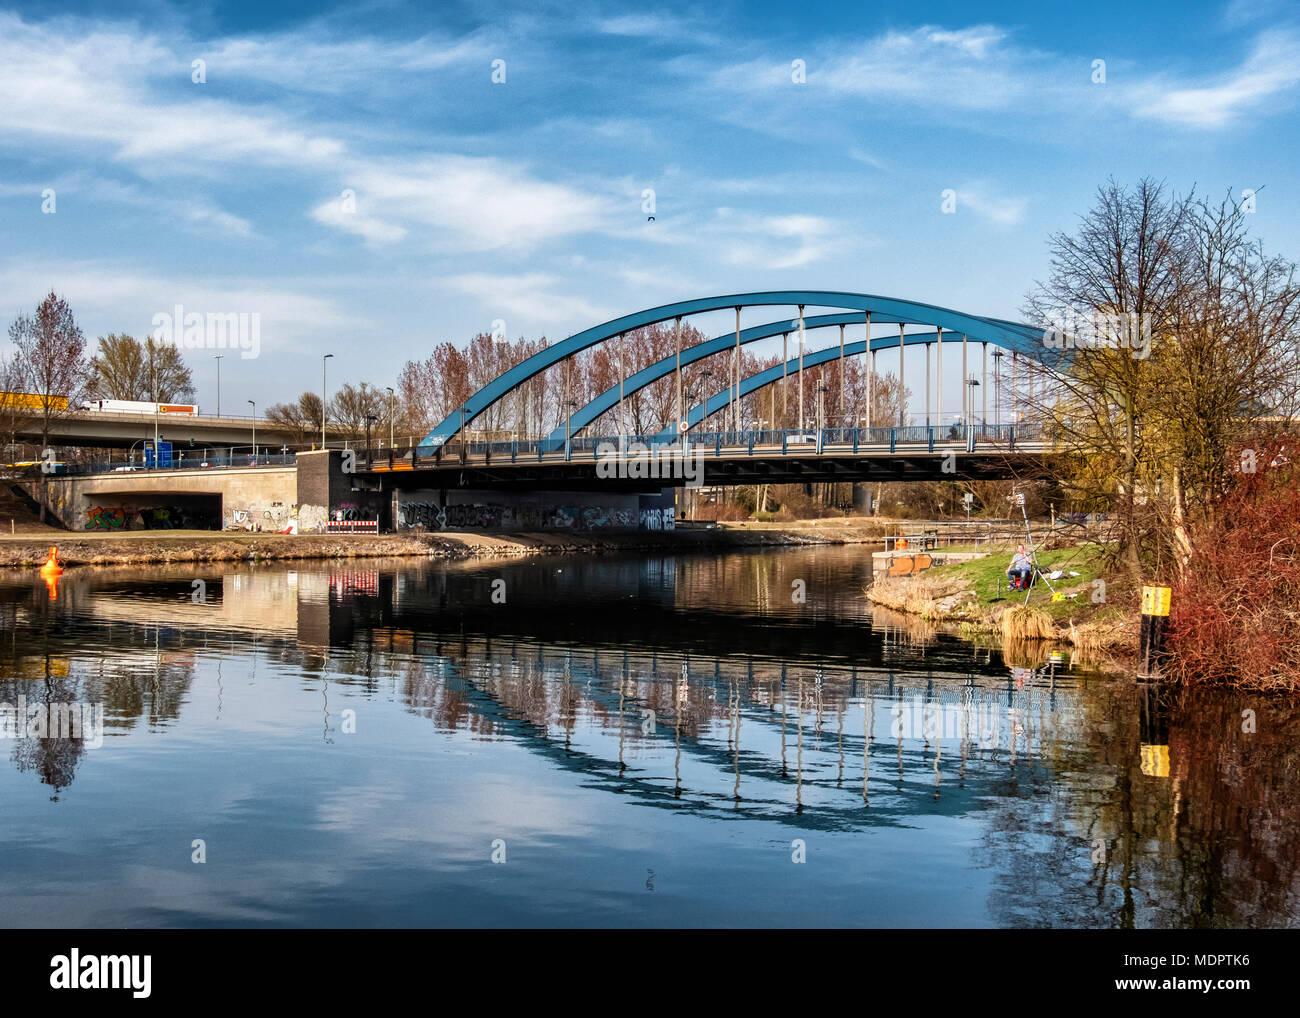 Berlin Charlottenburg-Wilmersdorf. Mörschbrücke. steel tied-arch road bridge over the Westhafen canal & man fishing Stock Photo